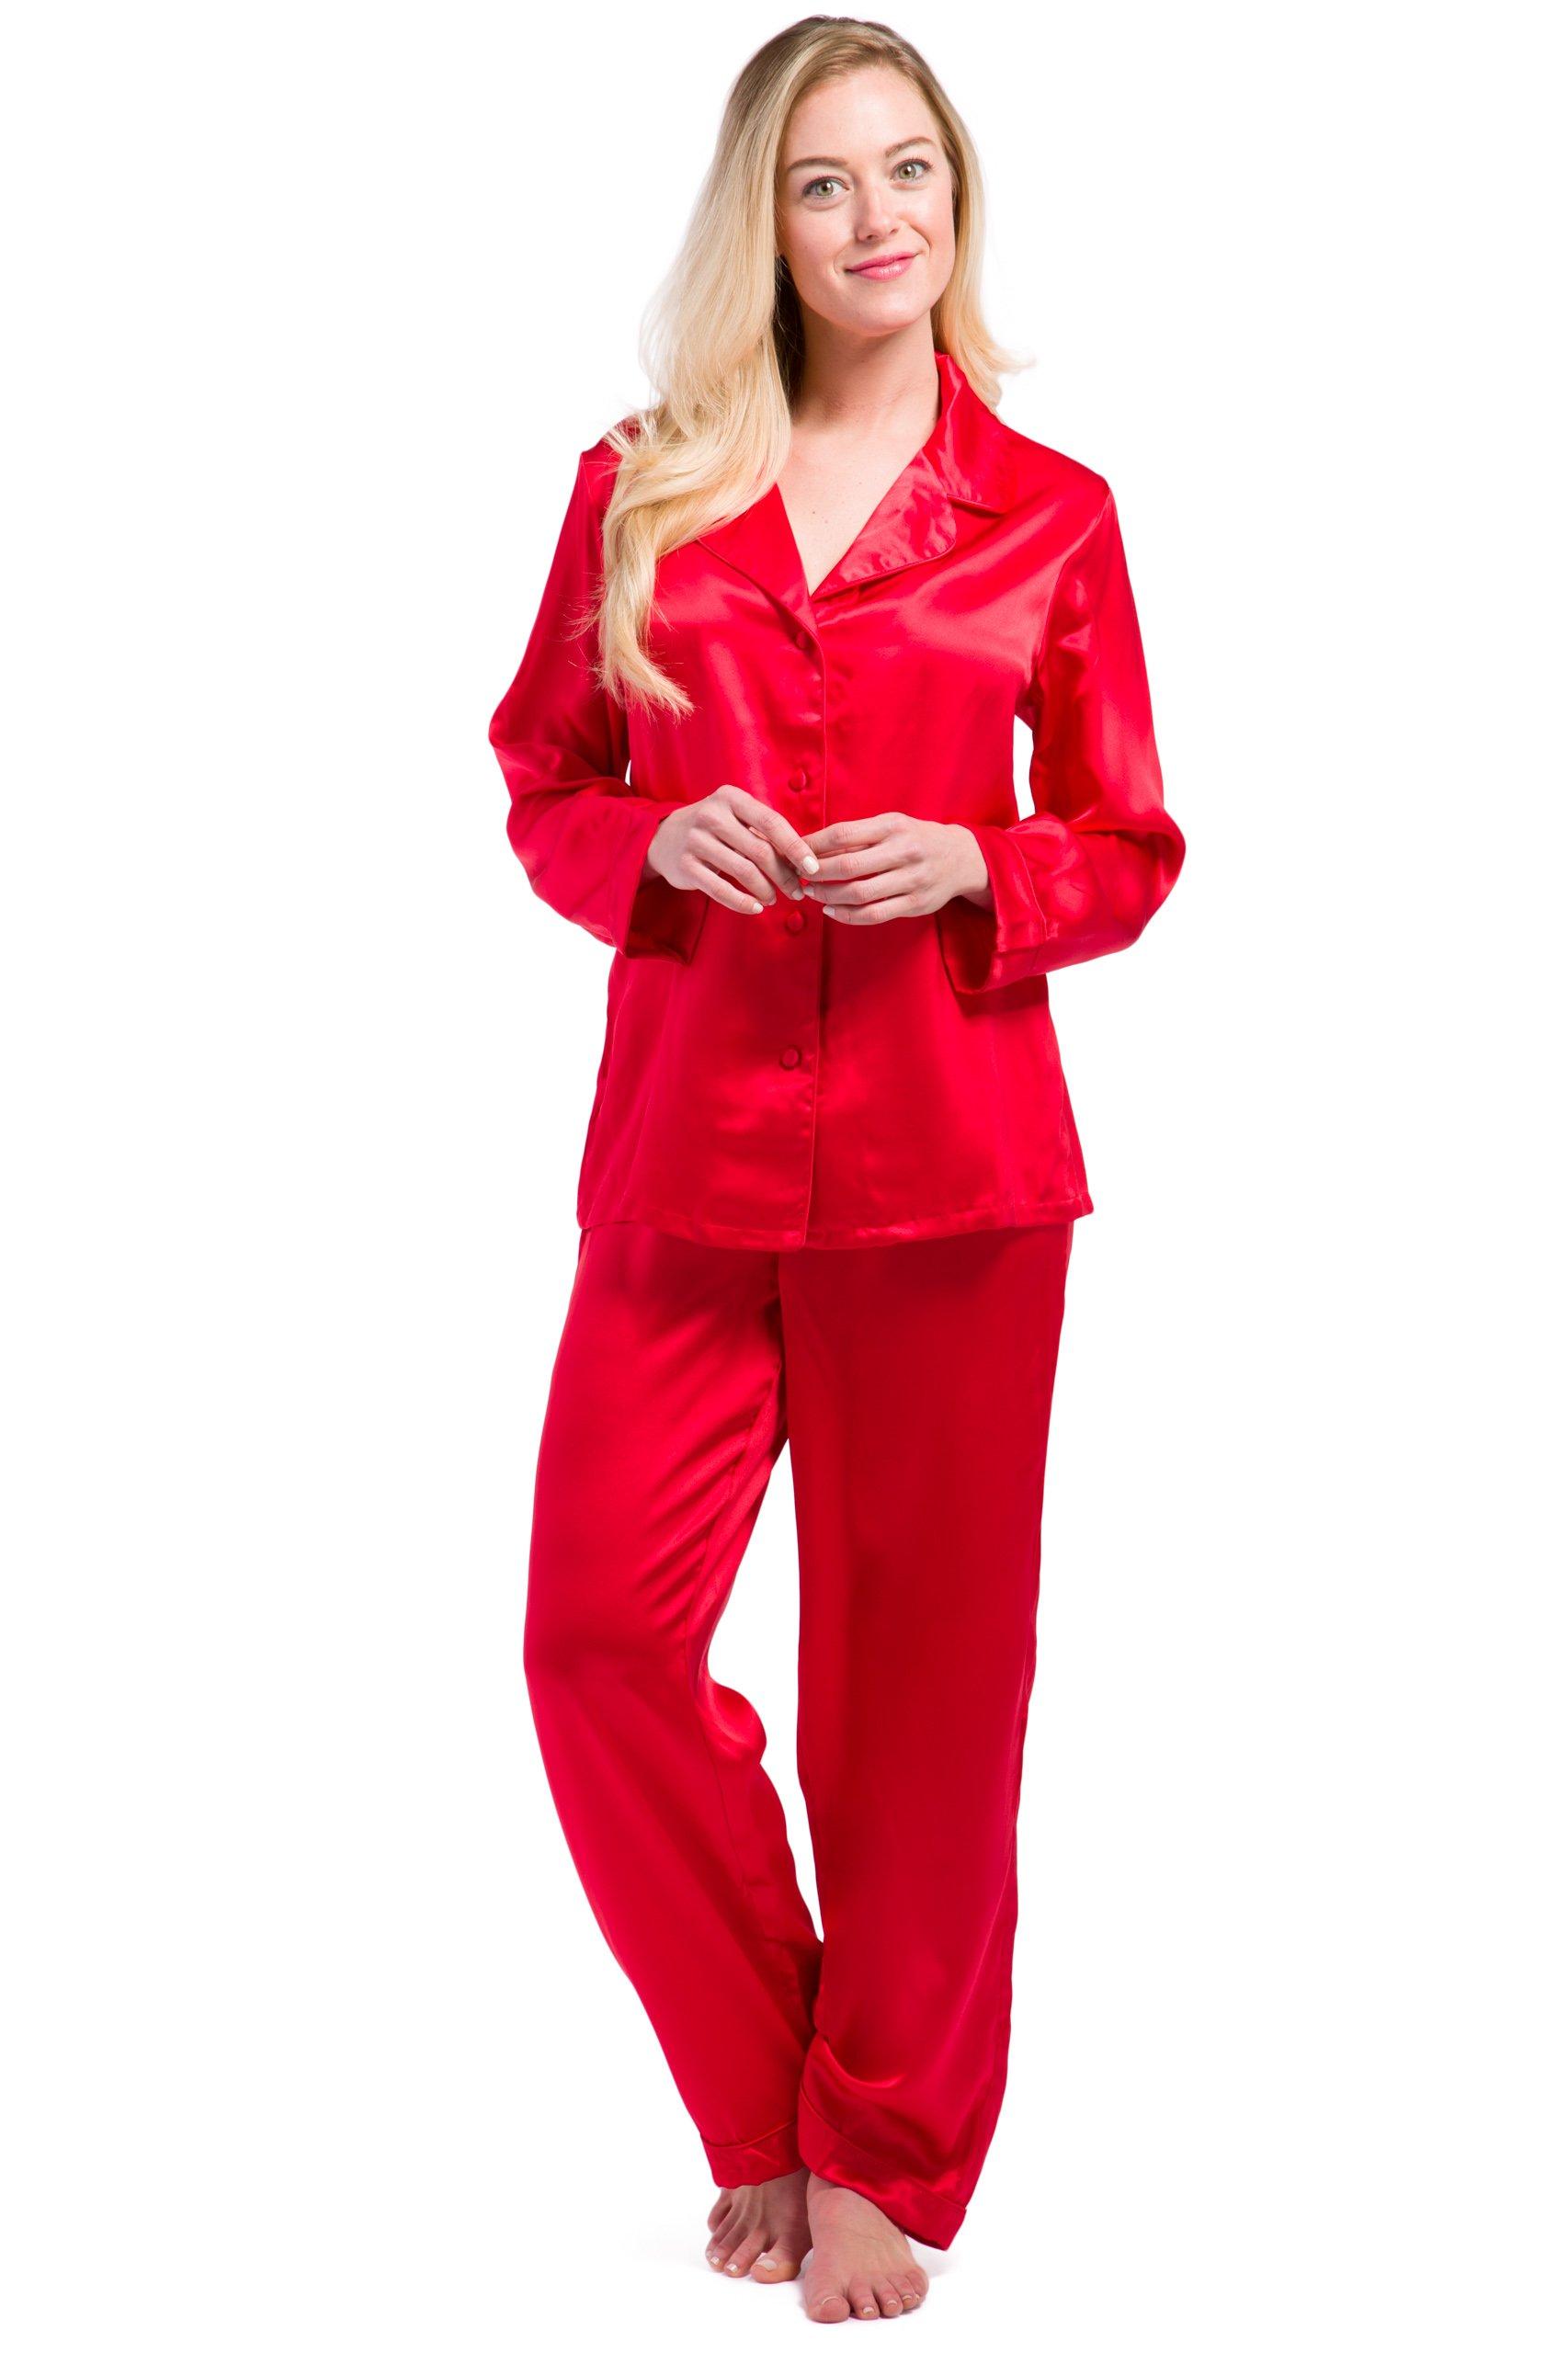 Fishers Finery Women's 100% Mulberry Silk Long Pajama Set; Gift Box (Red, S)